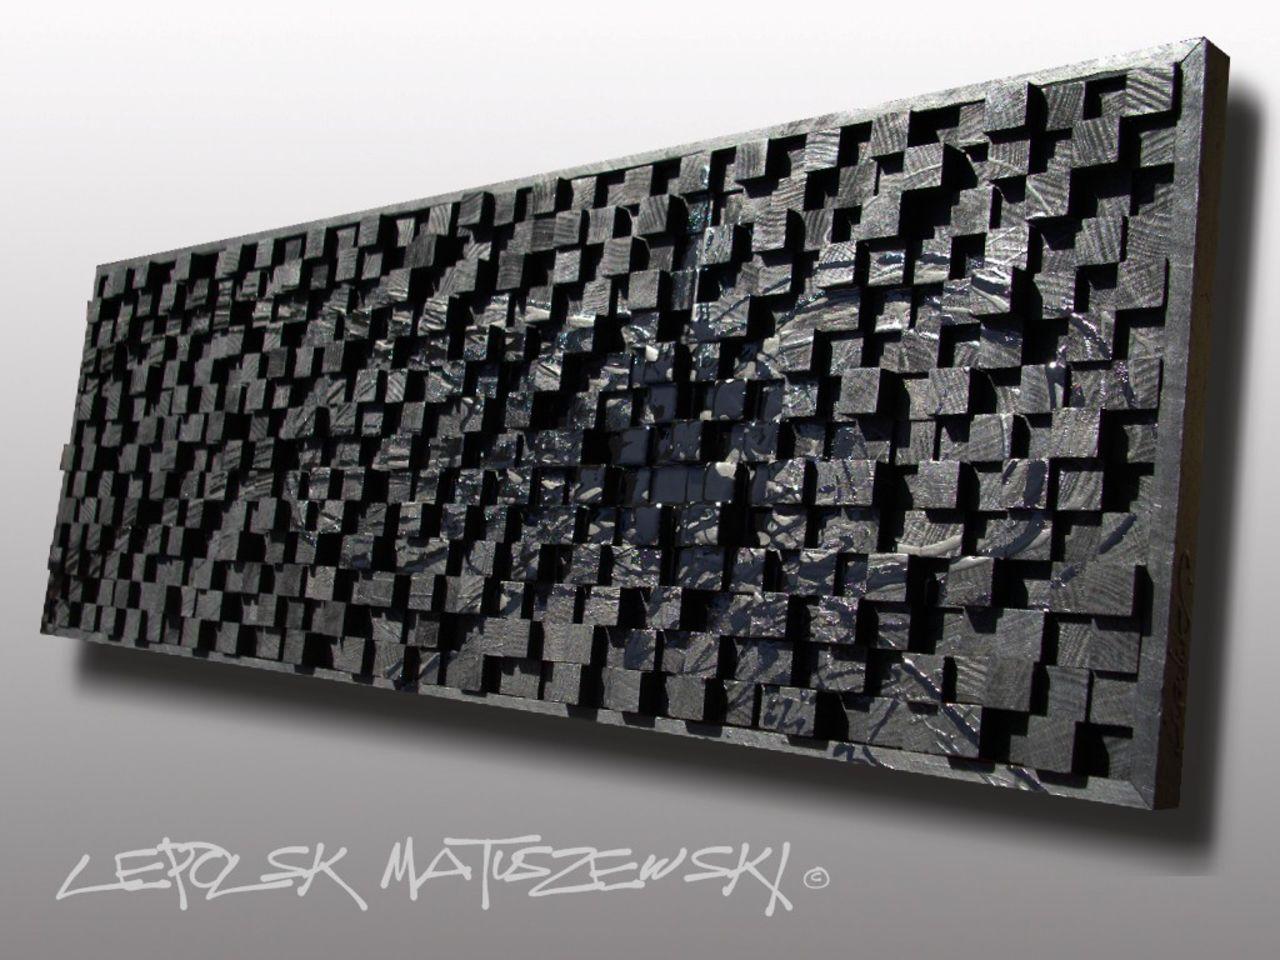 MISTER K  (Lepolsk Matuszewski) PROTOTYPE 616³ expressionnisme abstrait